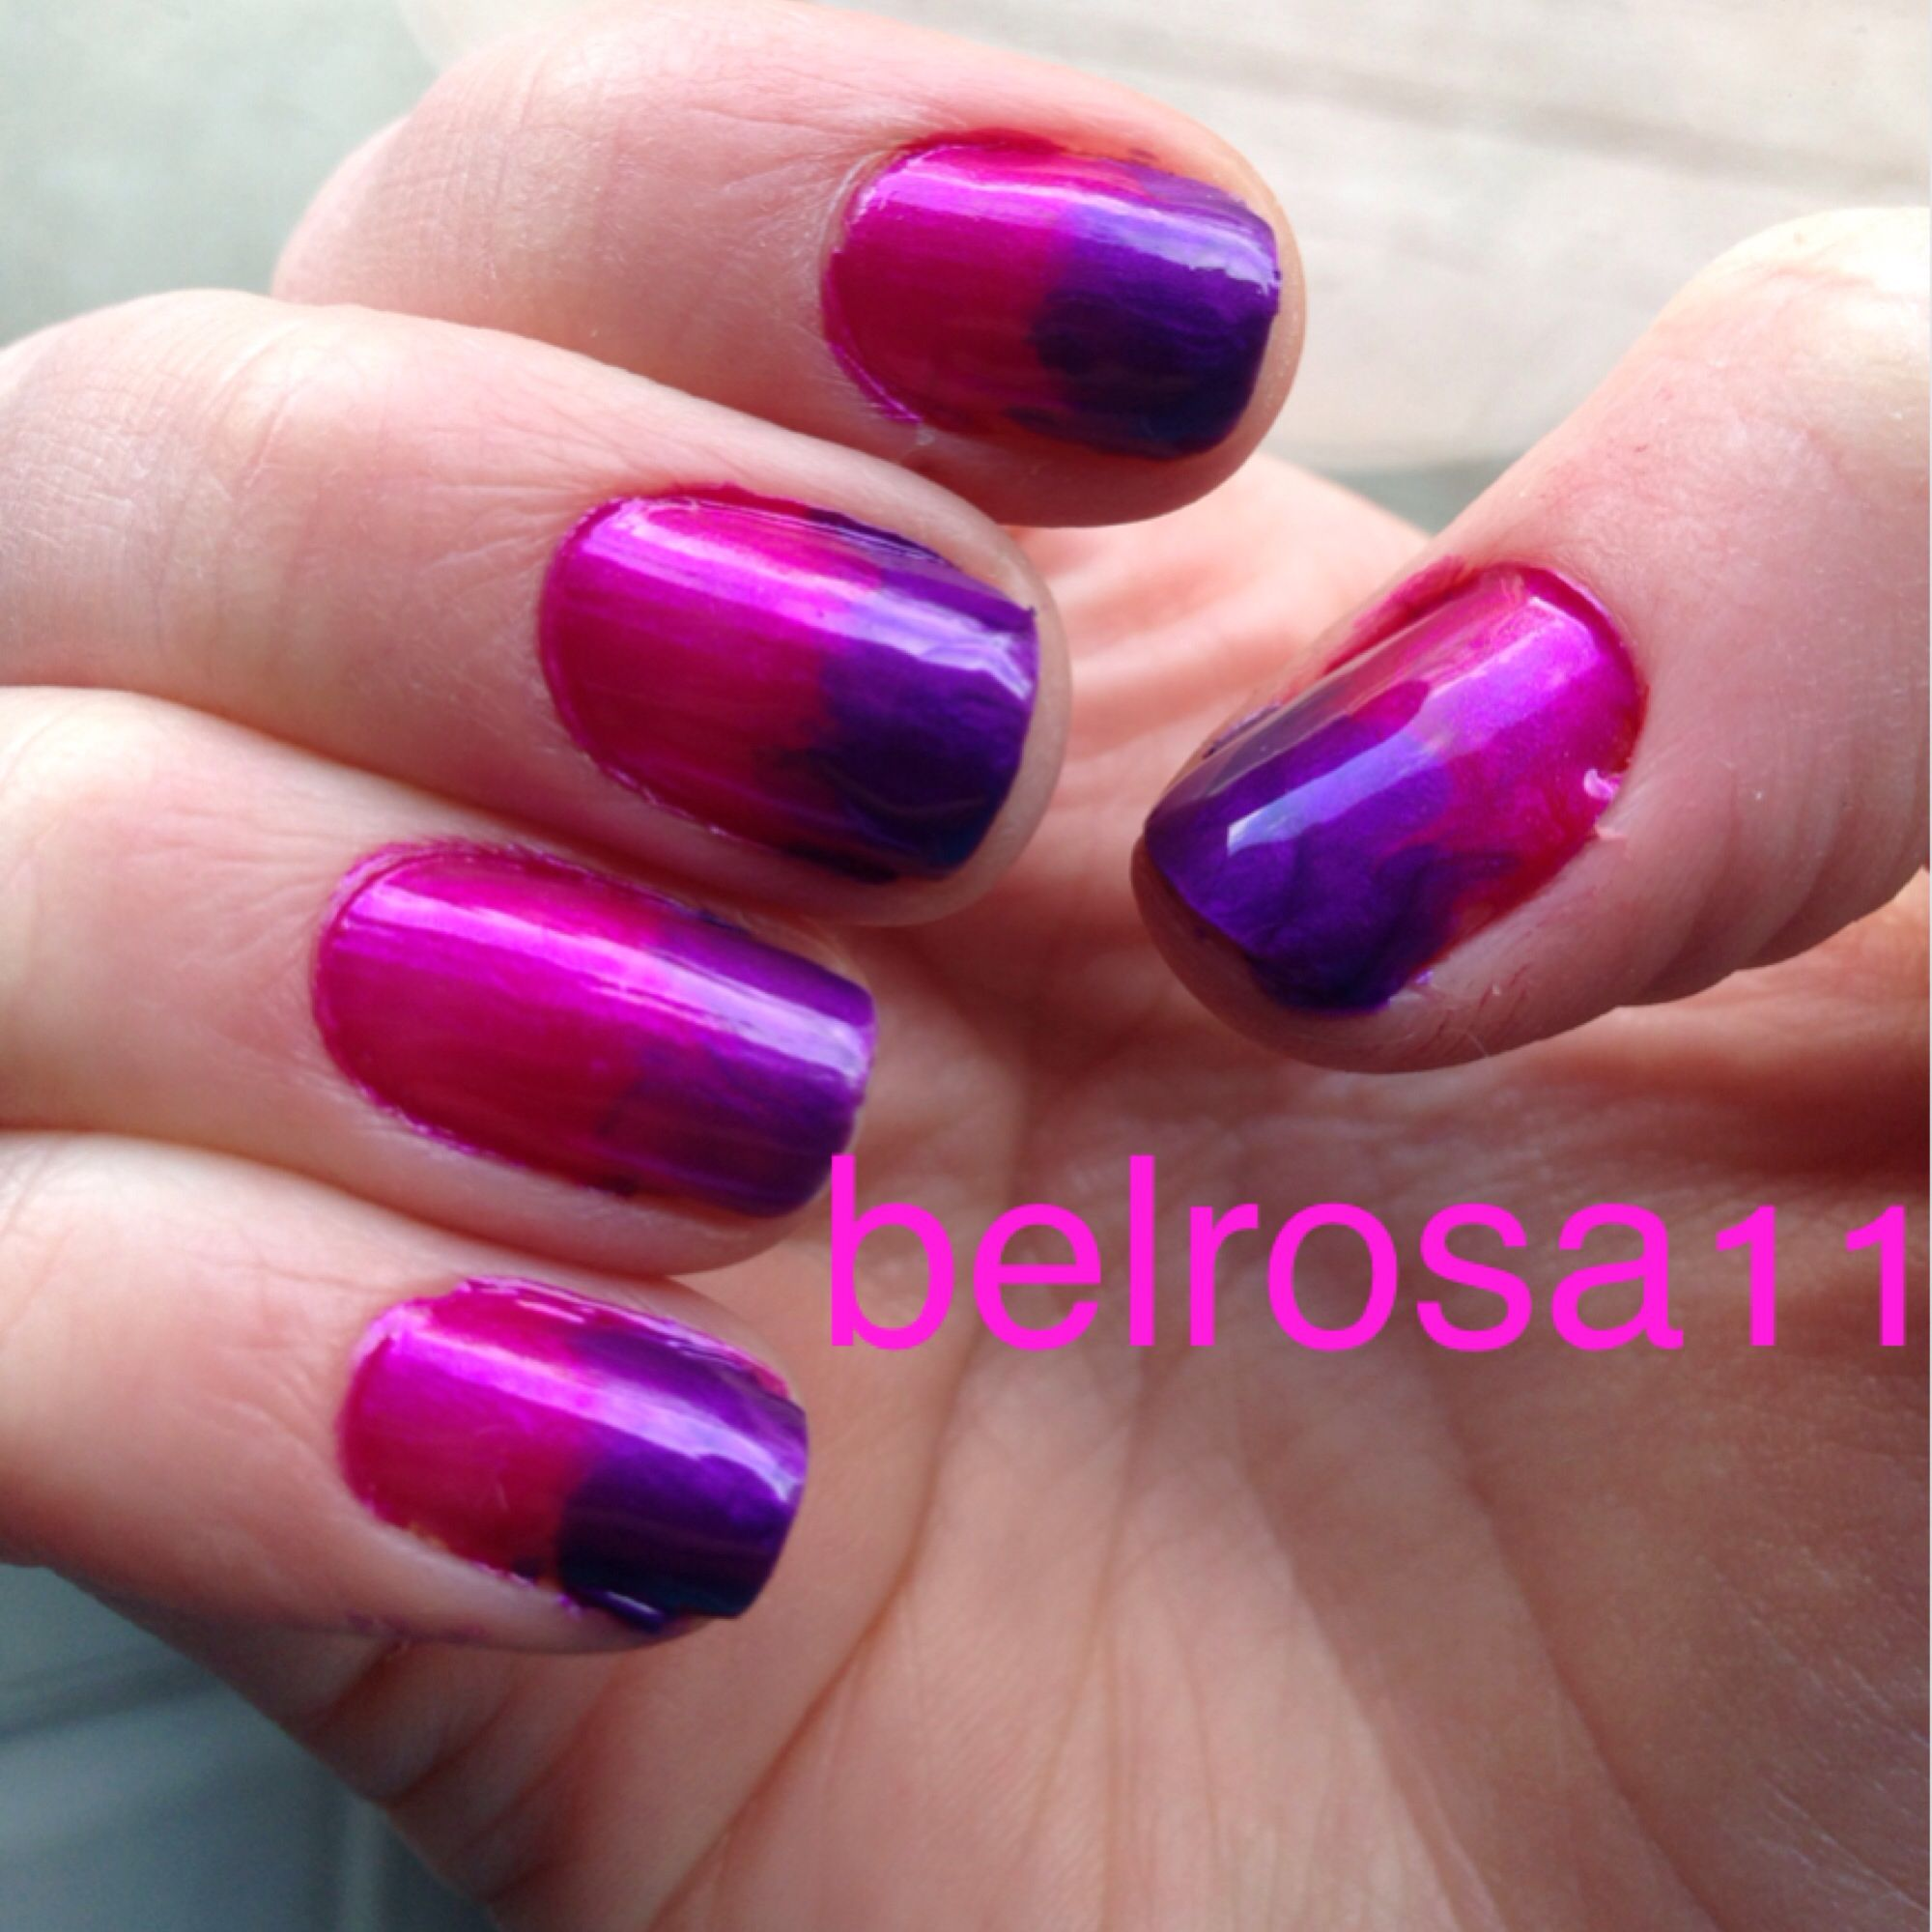 Pink and purple swirl nails by belrosa nails pinterest mani